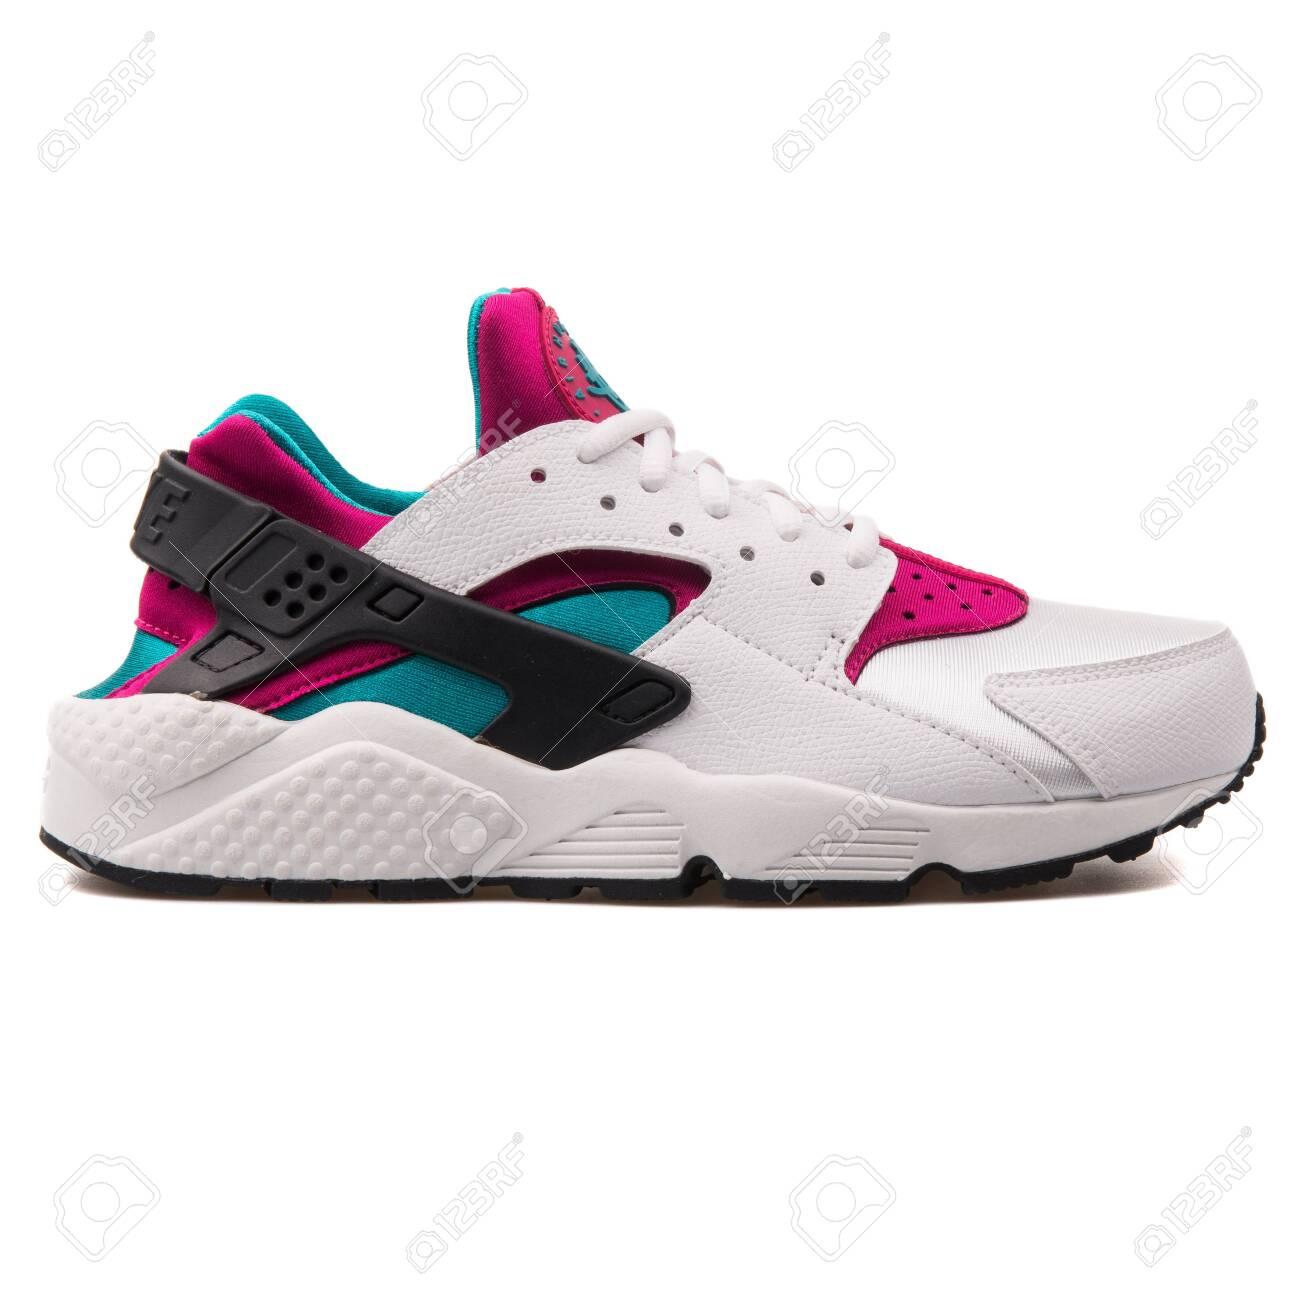 Nike Air Huarache Run White,.. Stock